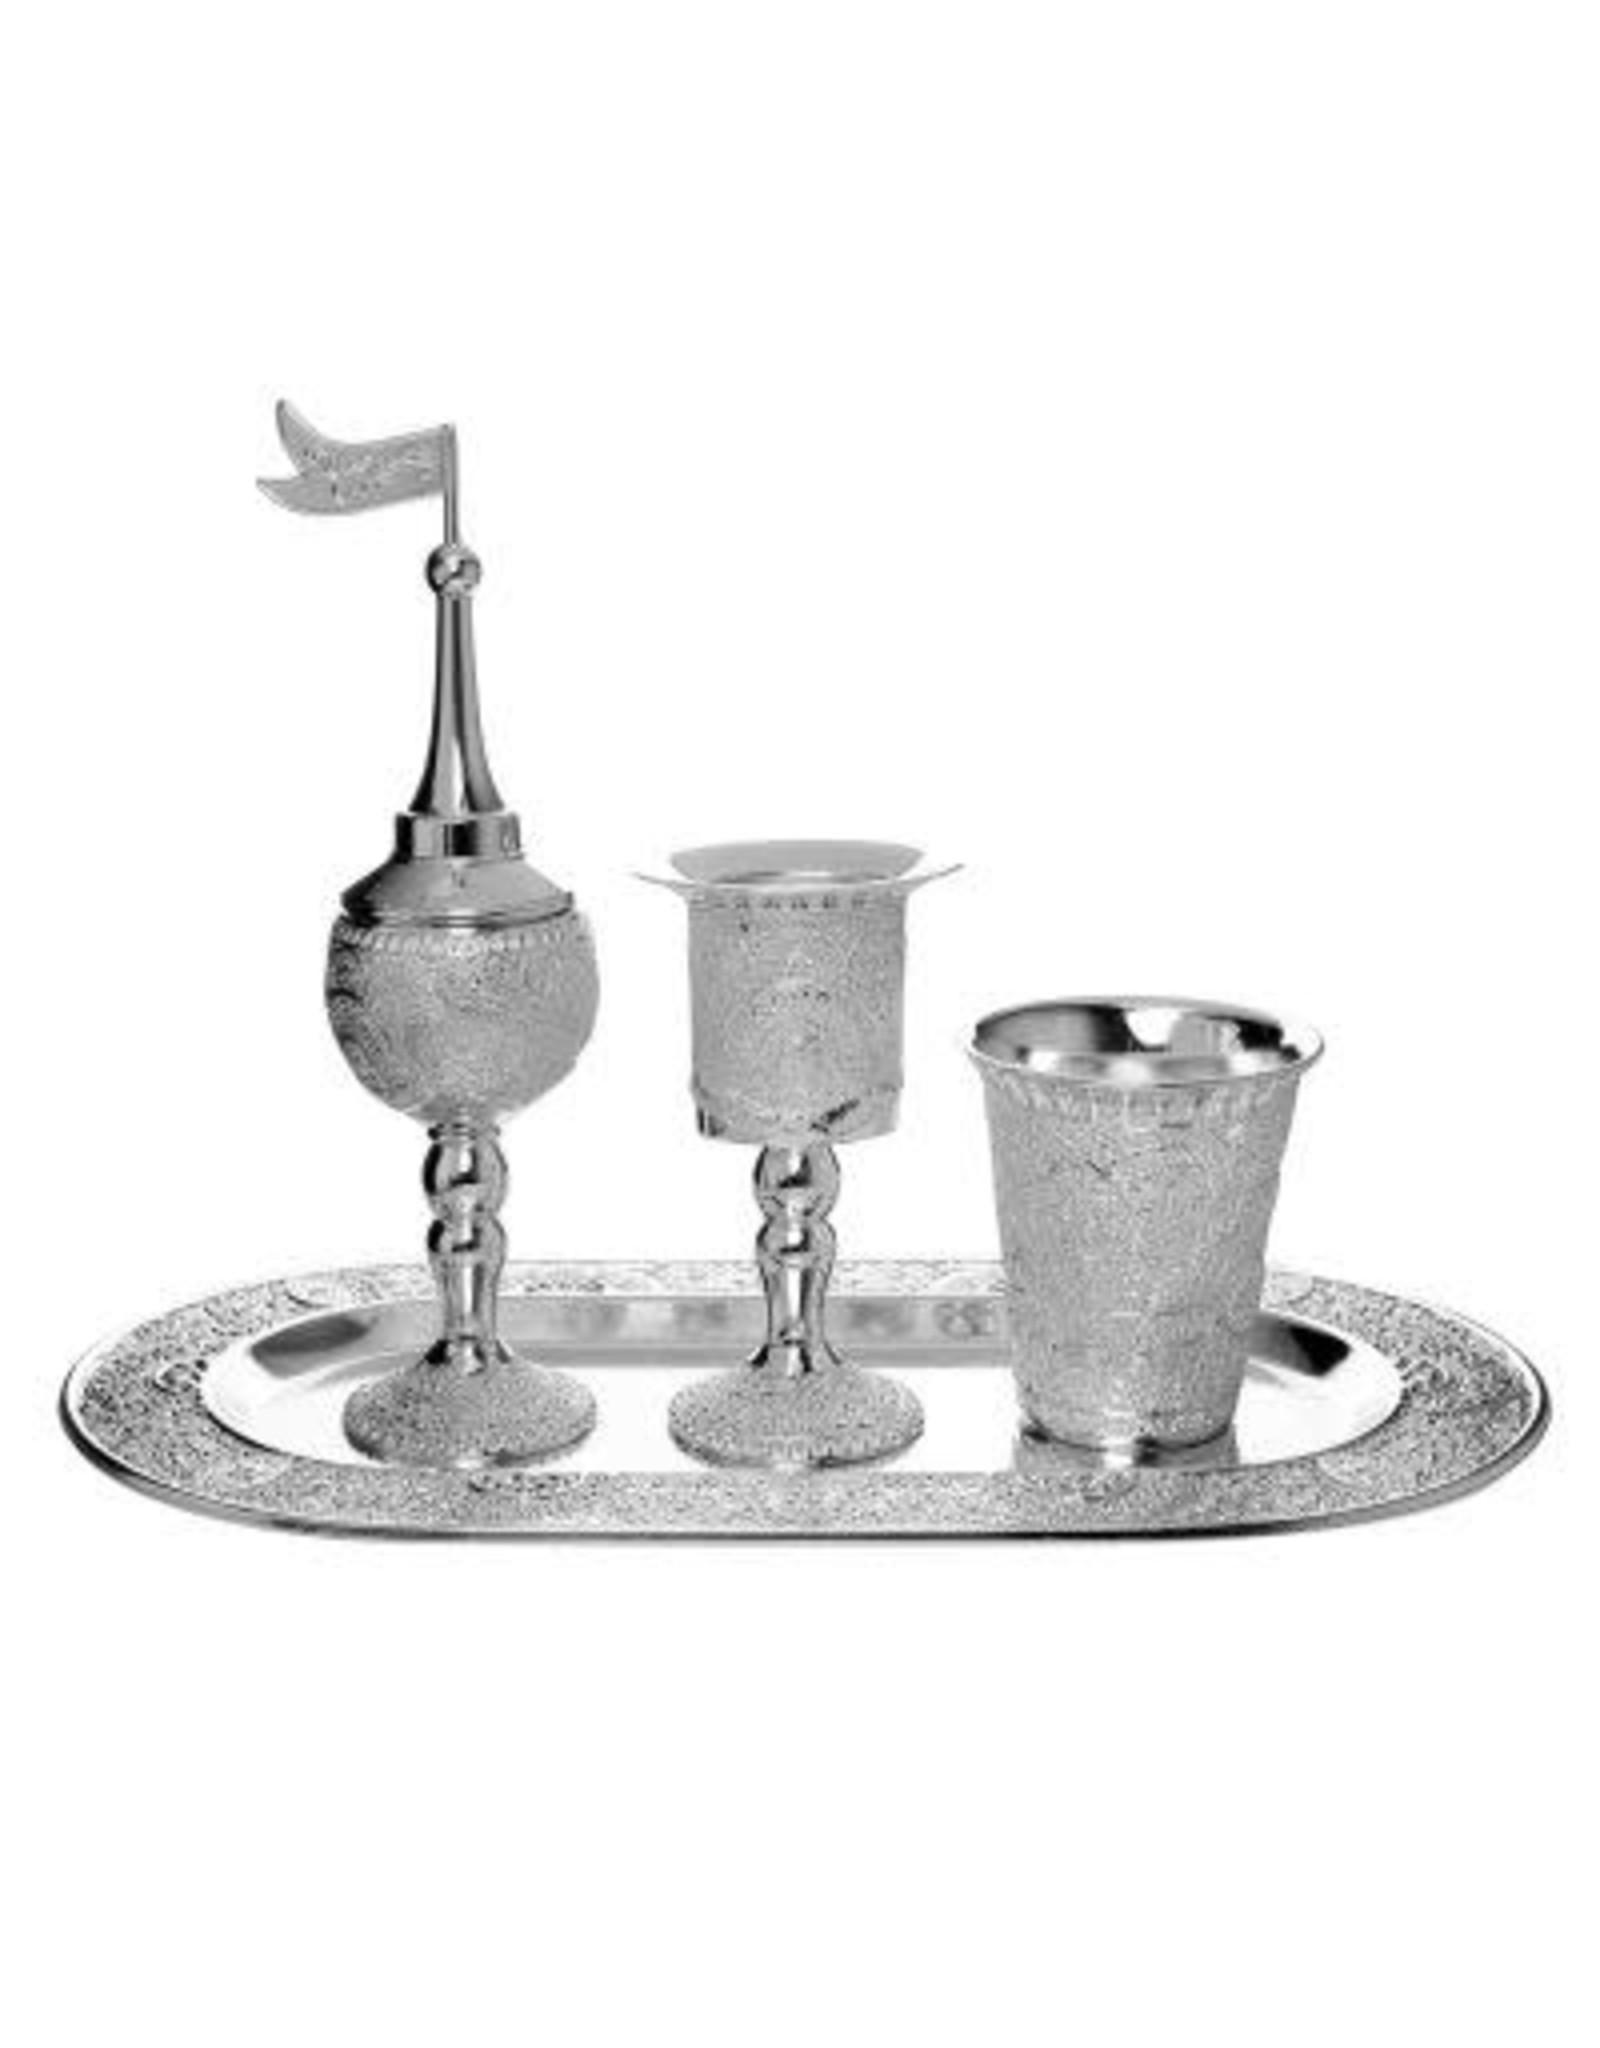 58267 Havdalah Set Oval Tray Filigree Design Silver Plated